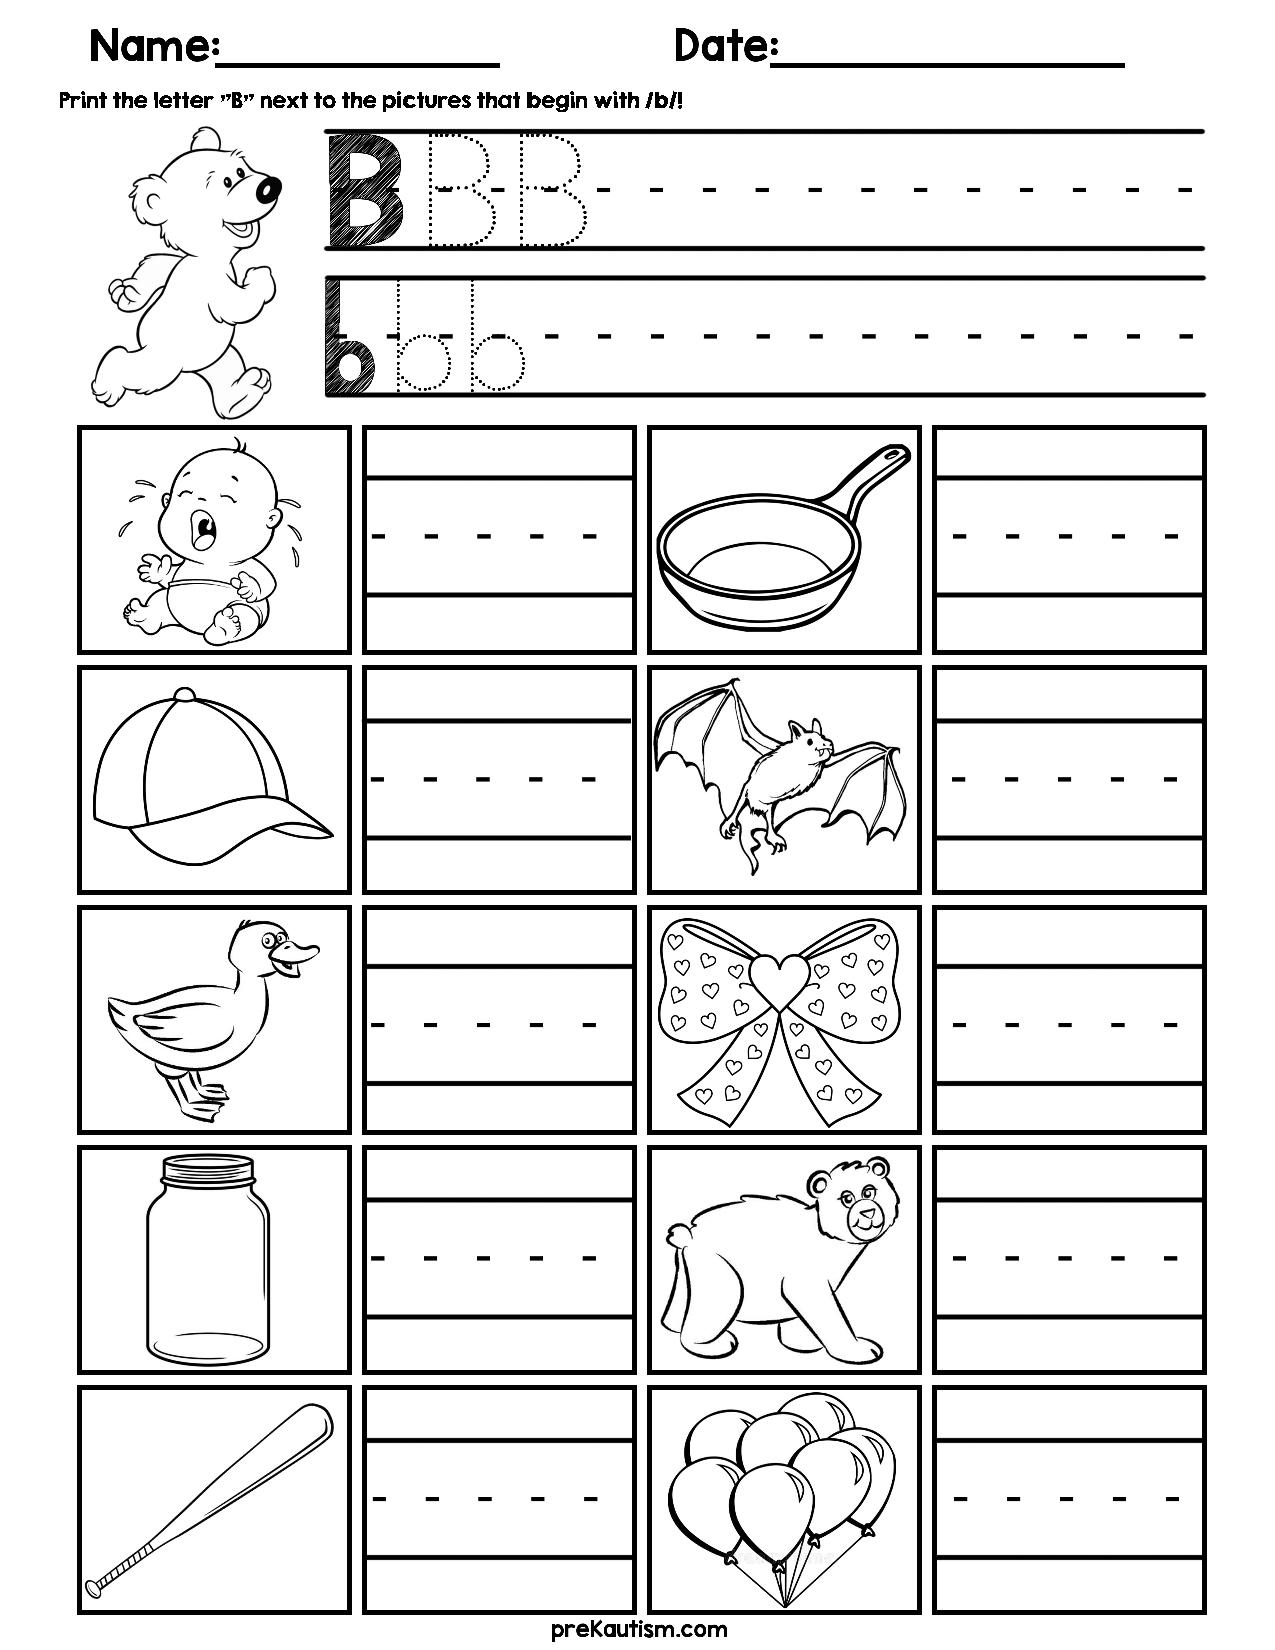 Initial Consonant Practice Worksheets Consonant Practices Worksheets Alphabet Activities Preschool [ 1650 x 1275 Pixel ]